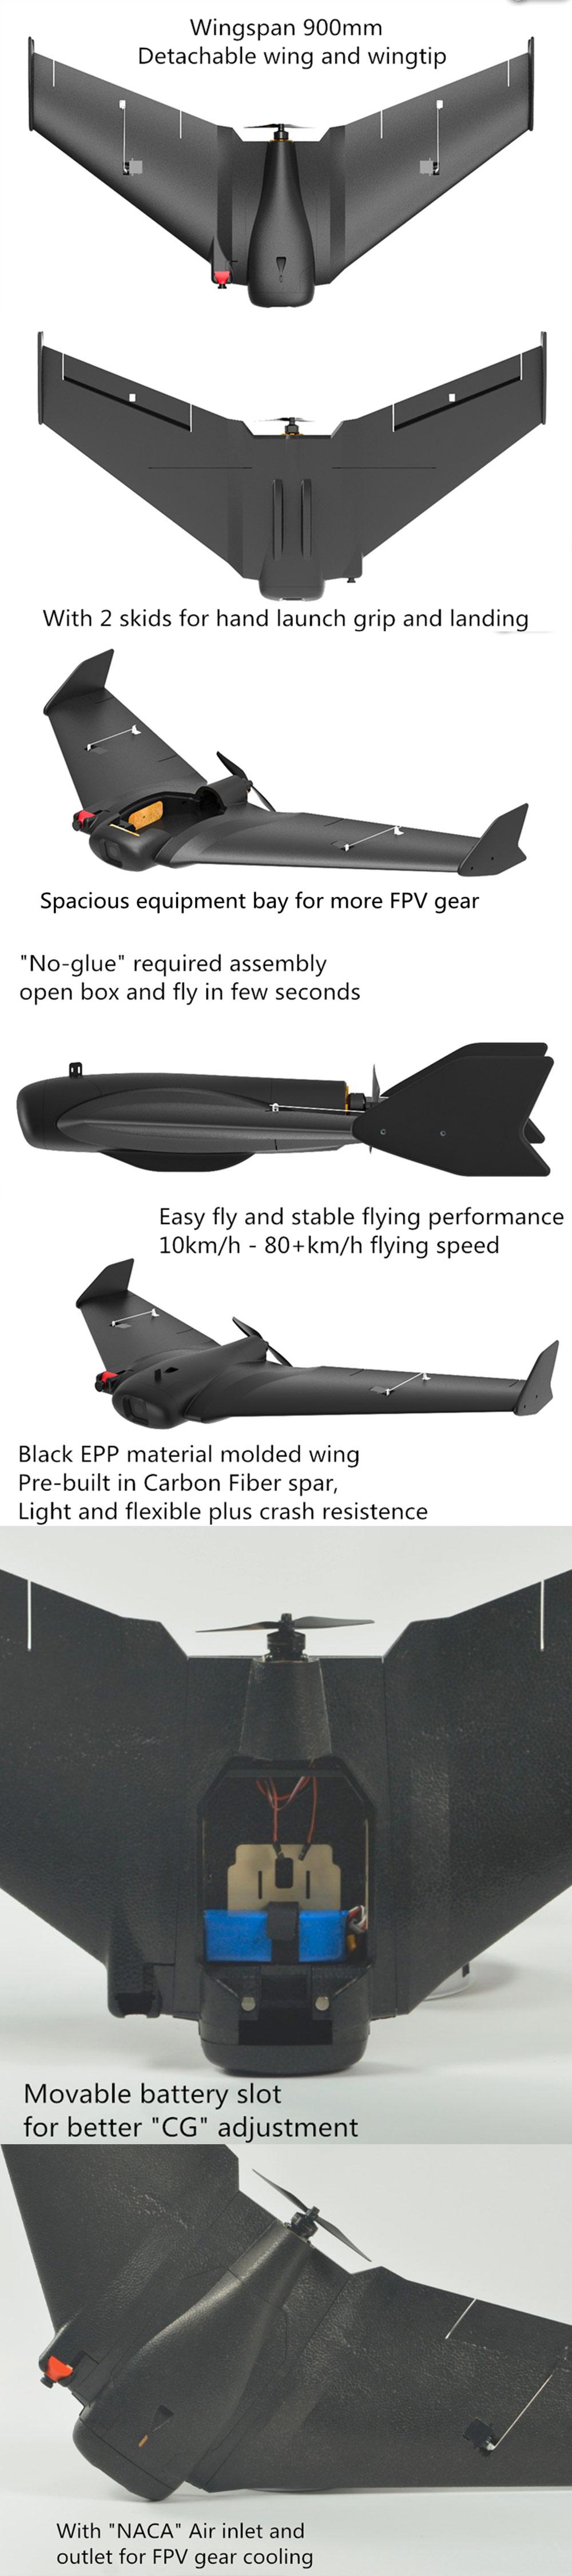 Busch 1584-h0-offenstall-laser-cut kit nuevo embalaje original